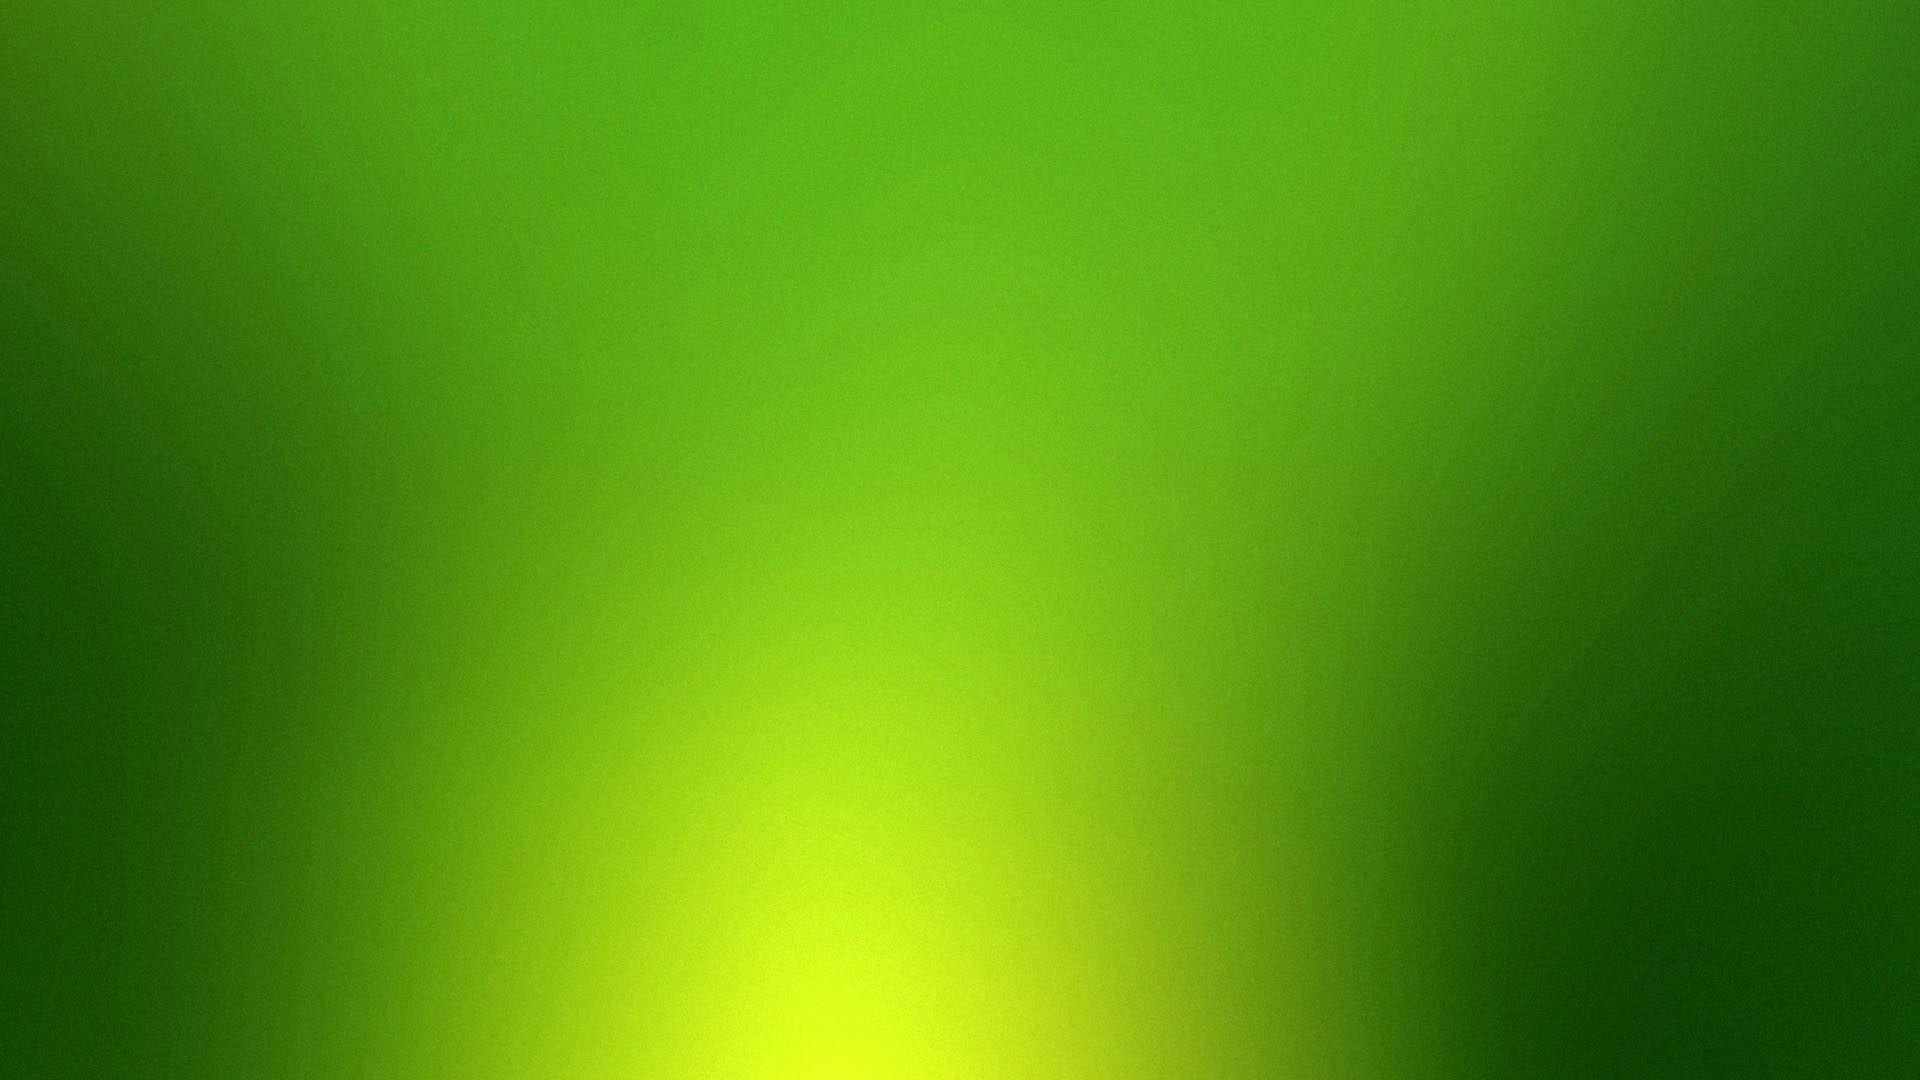 Light Green Backgrounds